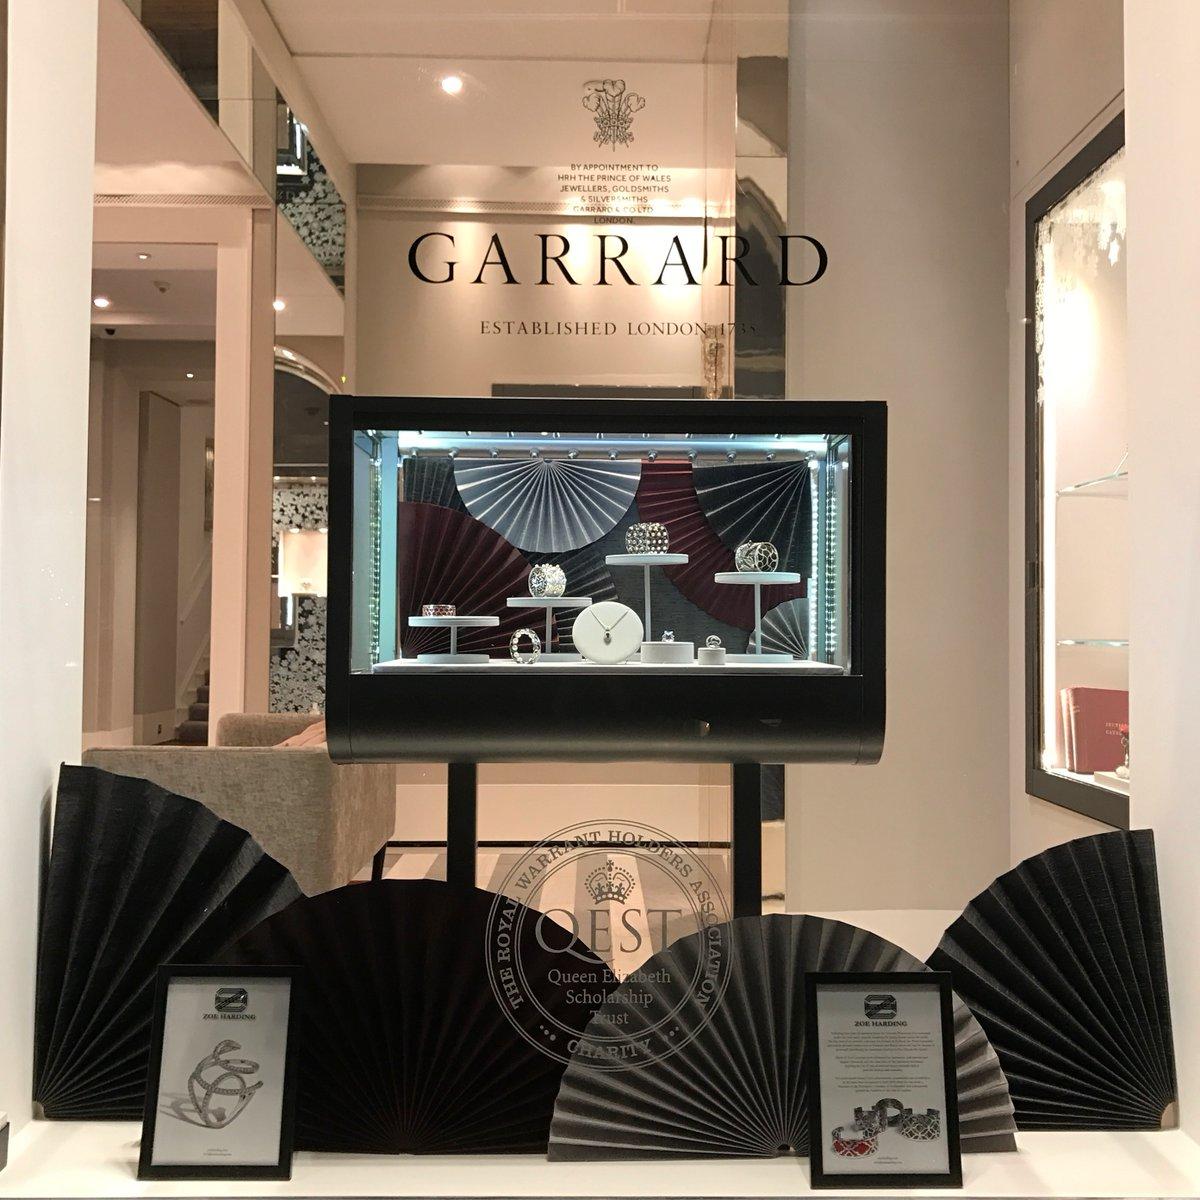 GARRARD WINDOW_THEY POSTED PICCzu2MoVWIAAAIY4.jpg